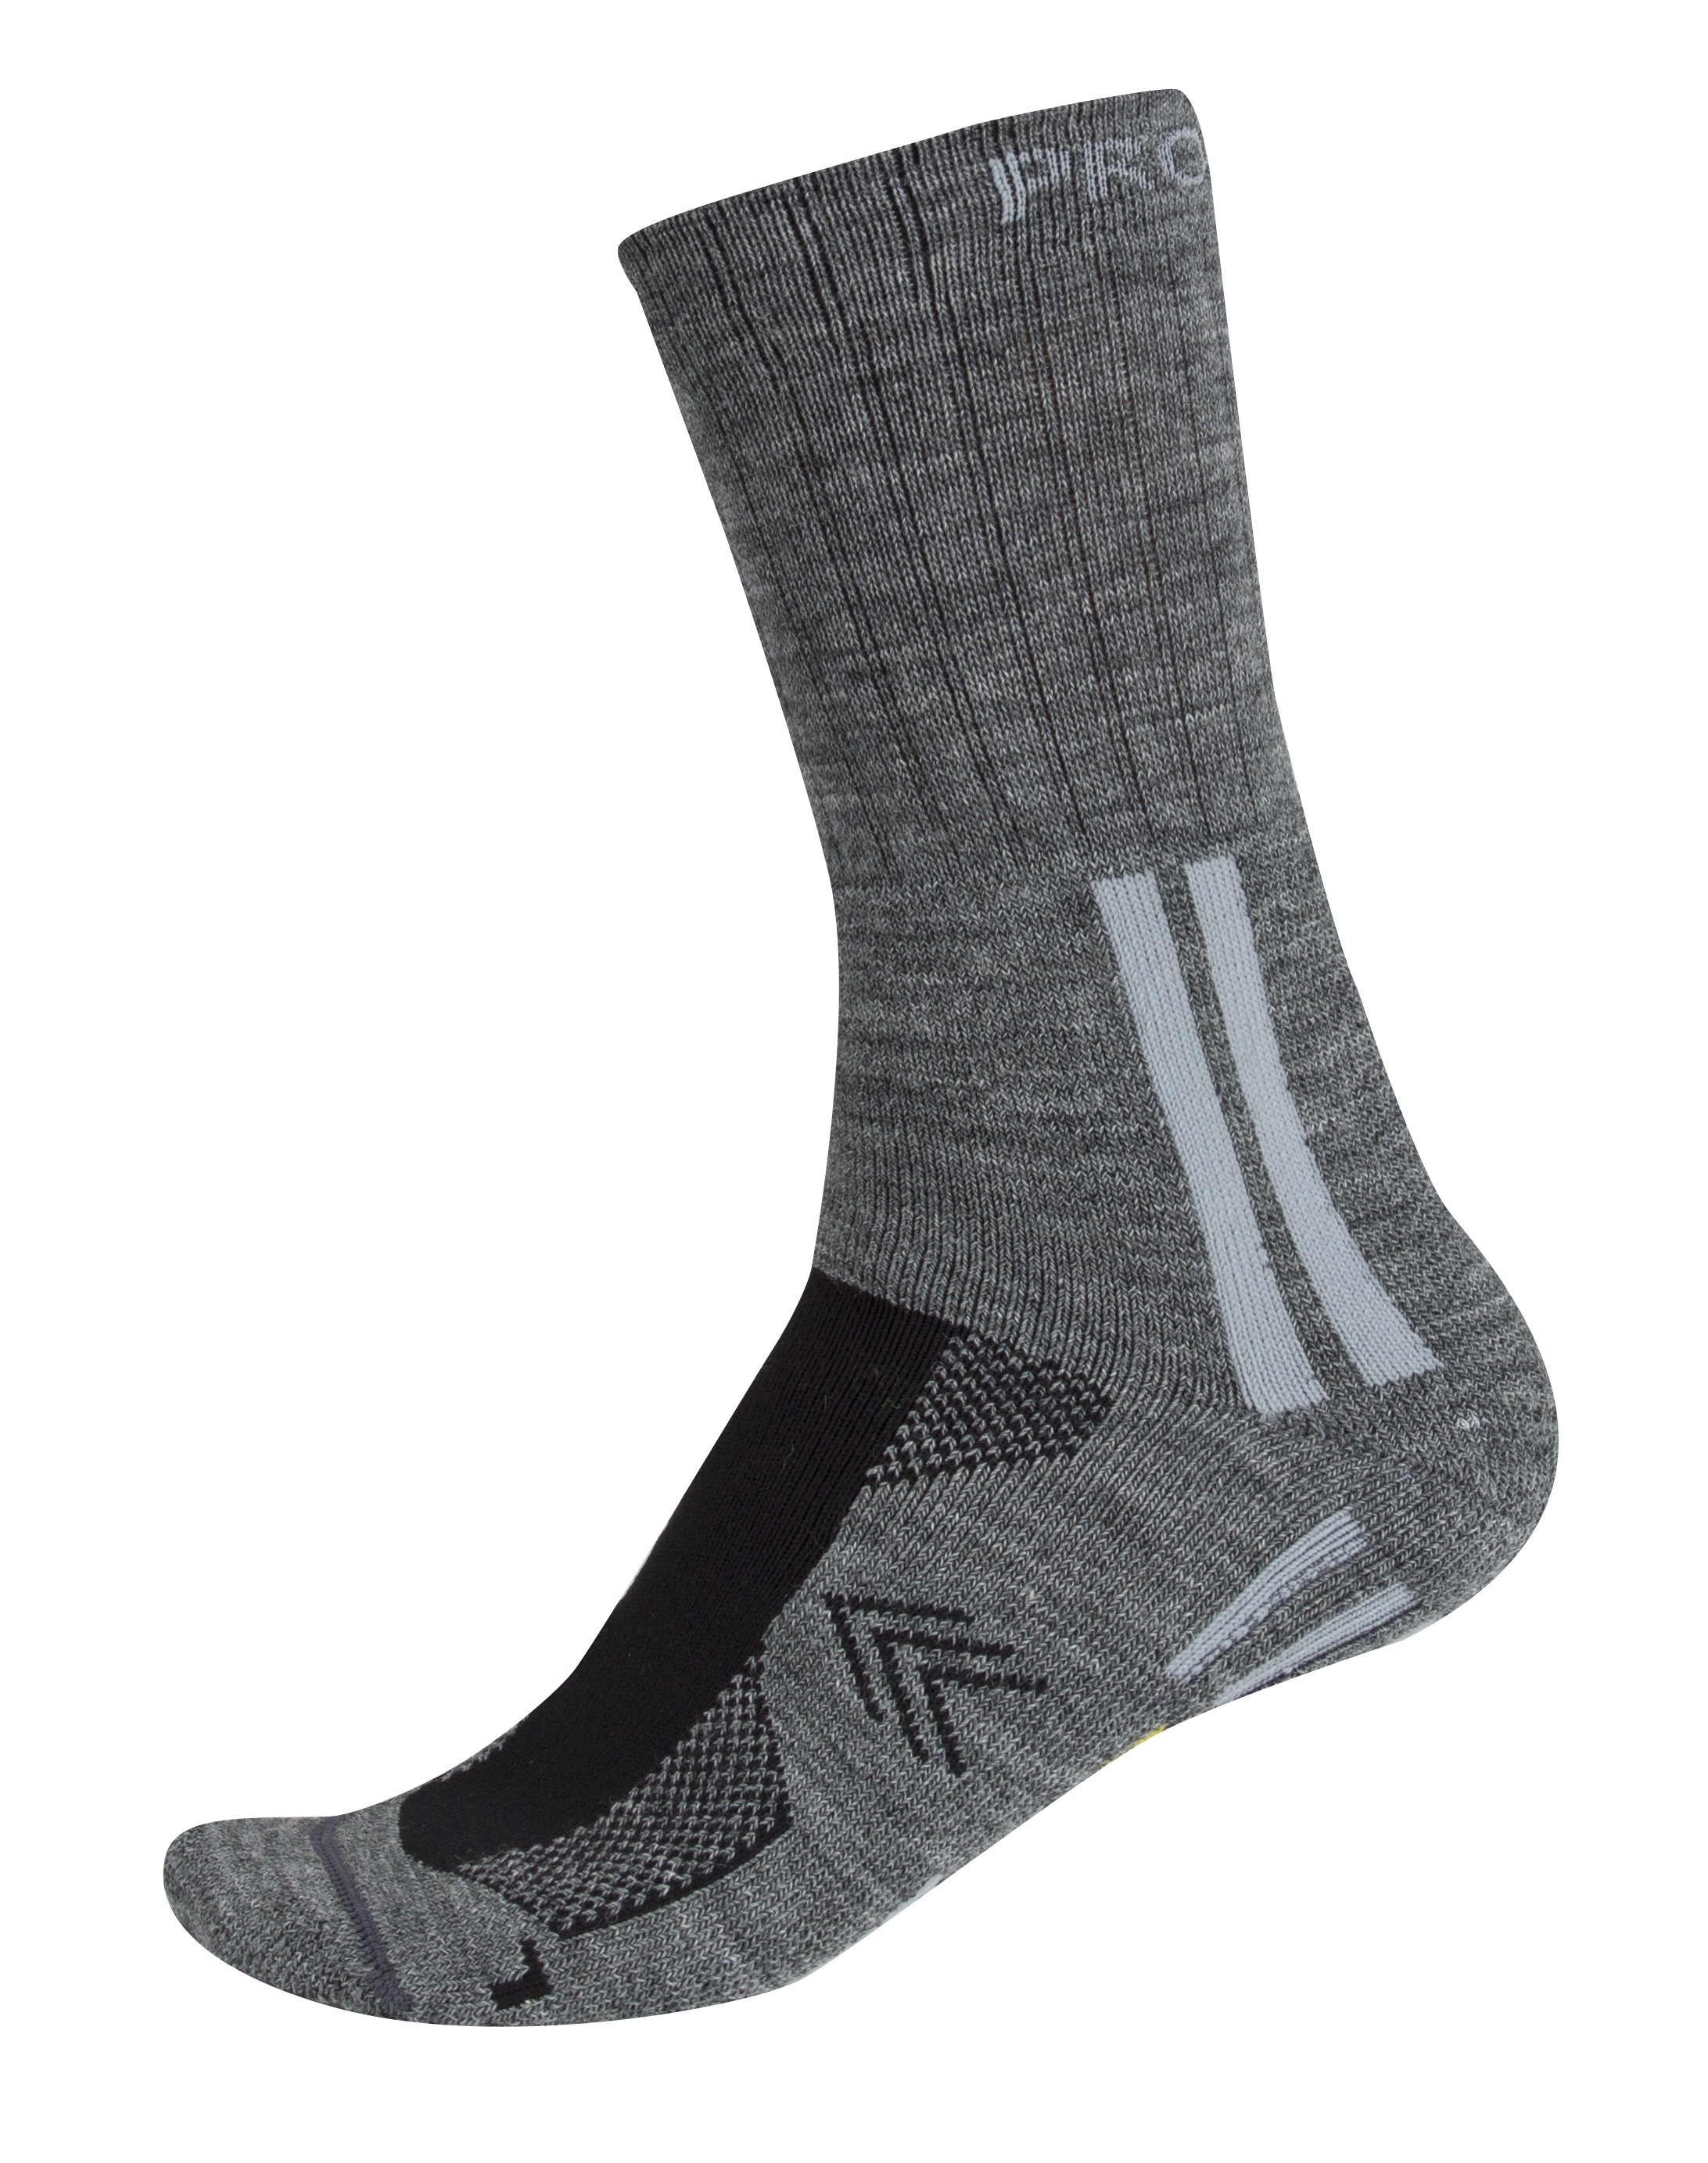 9027 Long Technical Sock